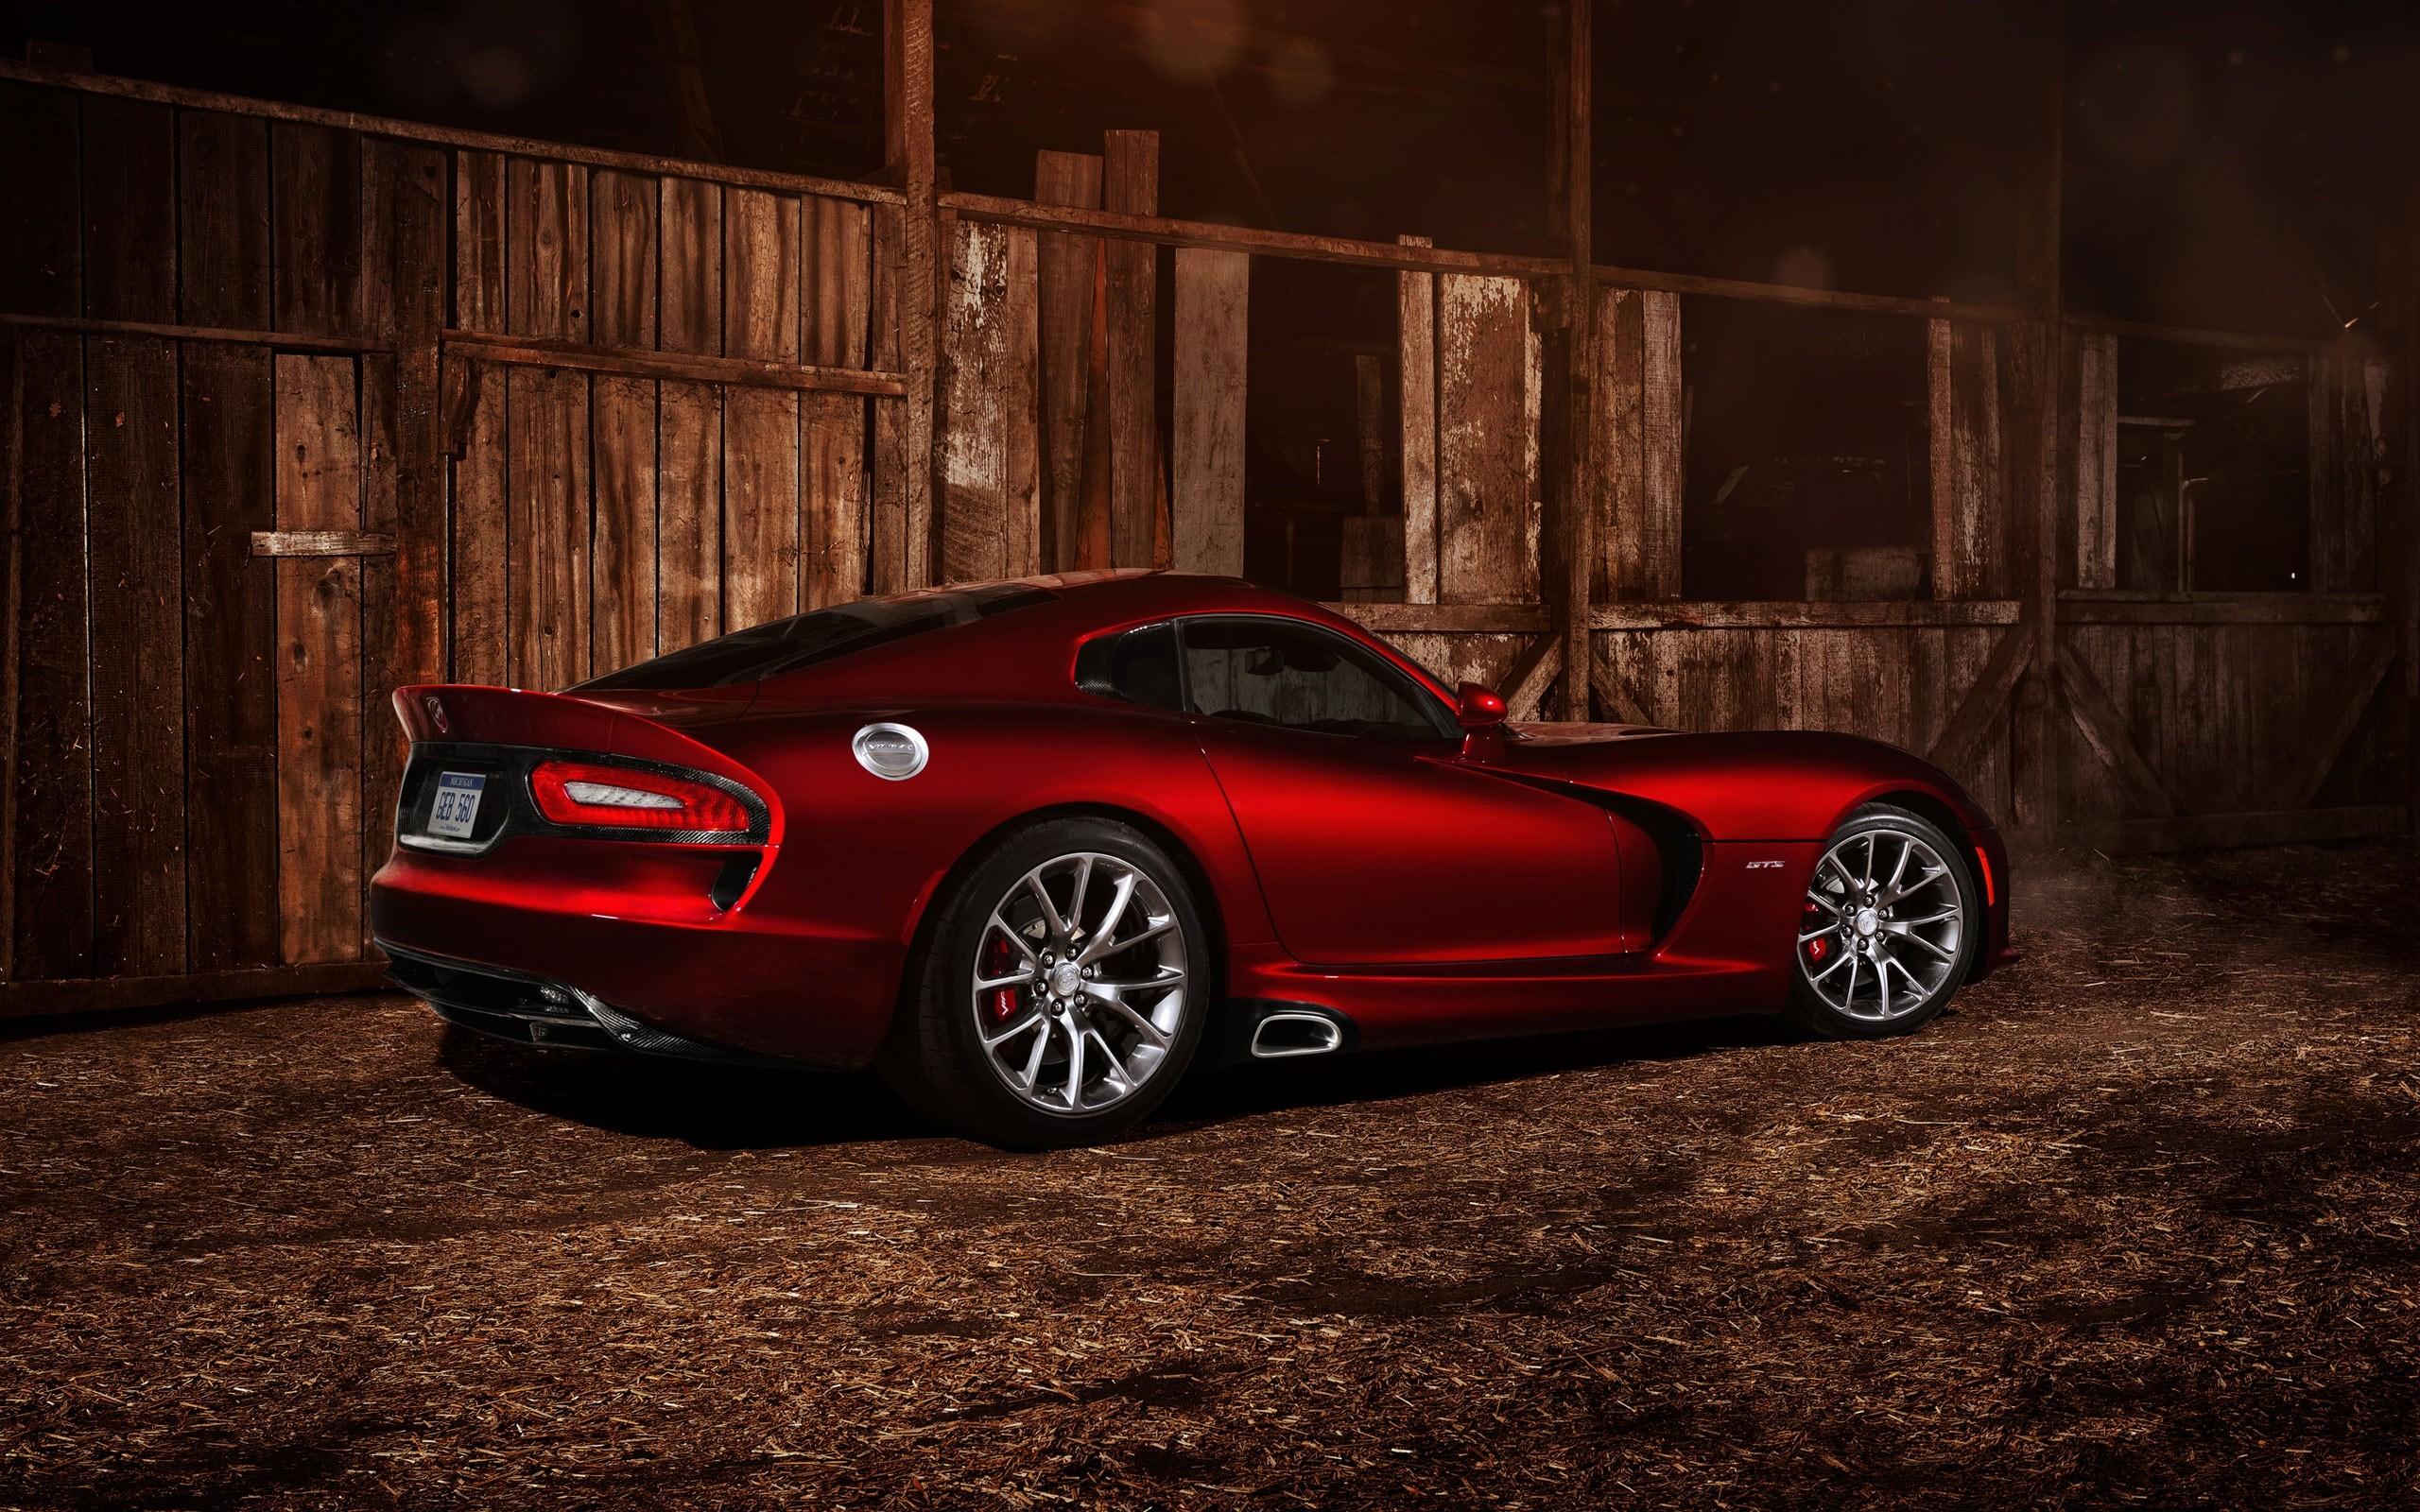 Stunning Dodge Viper Wallpaper